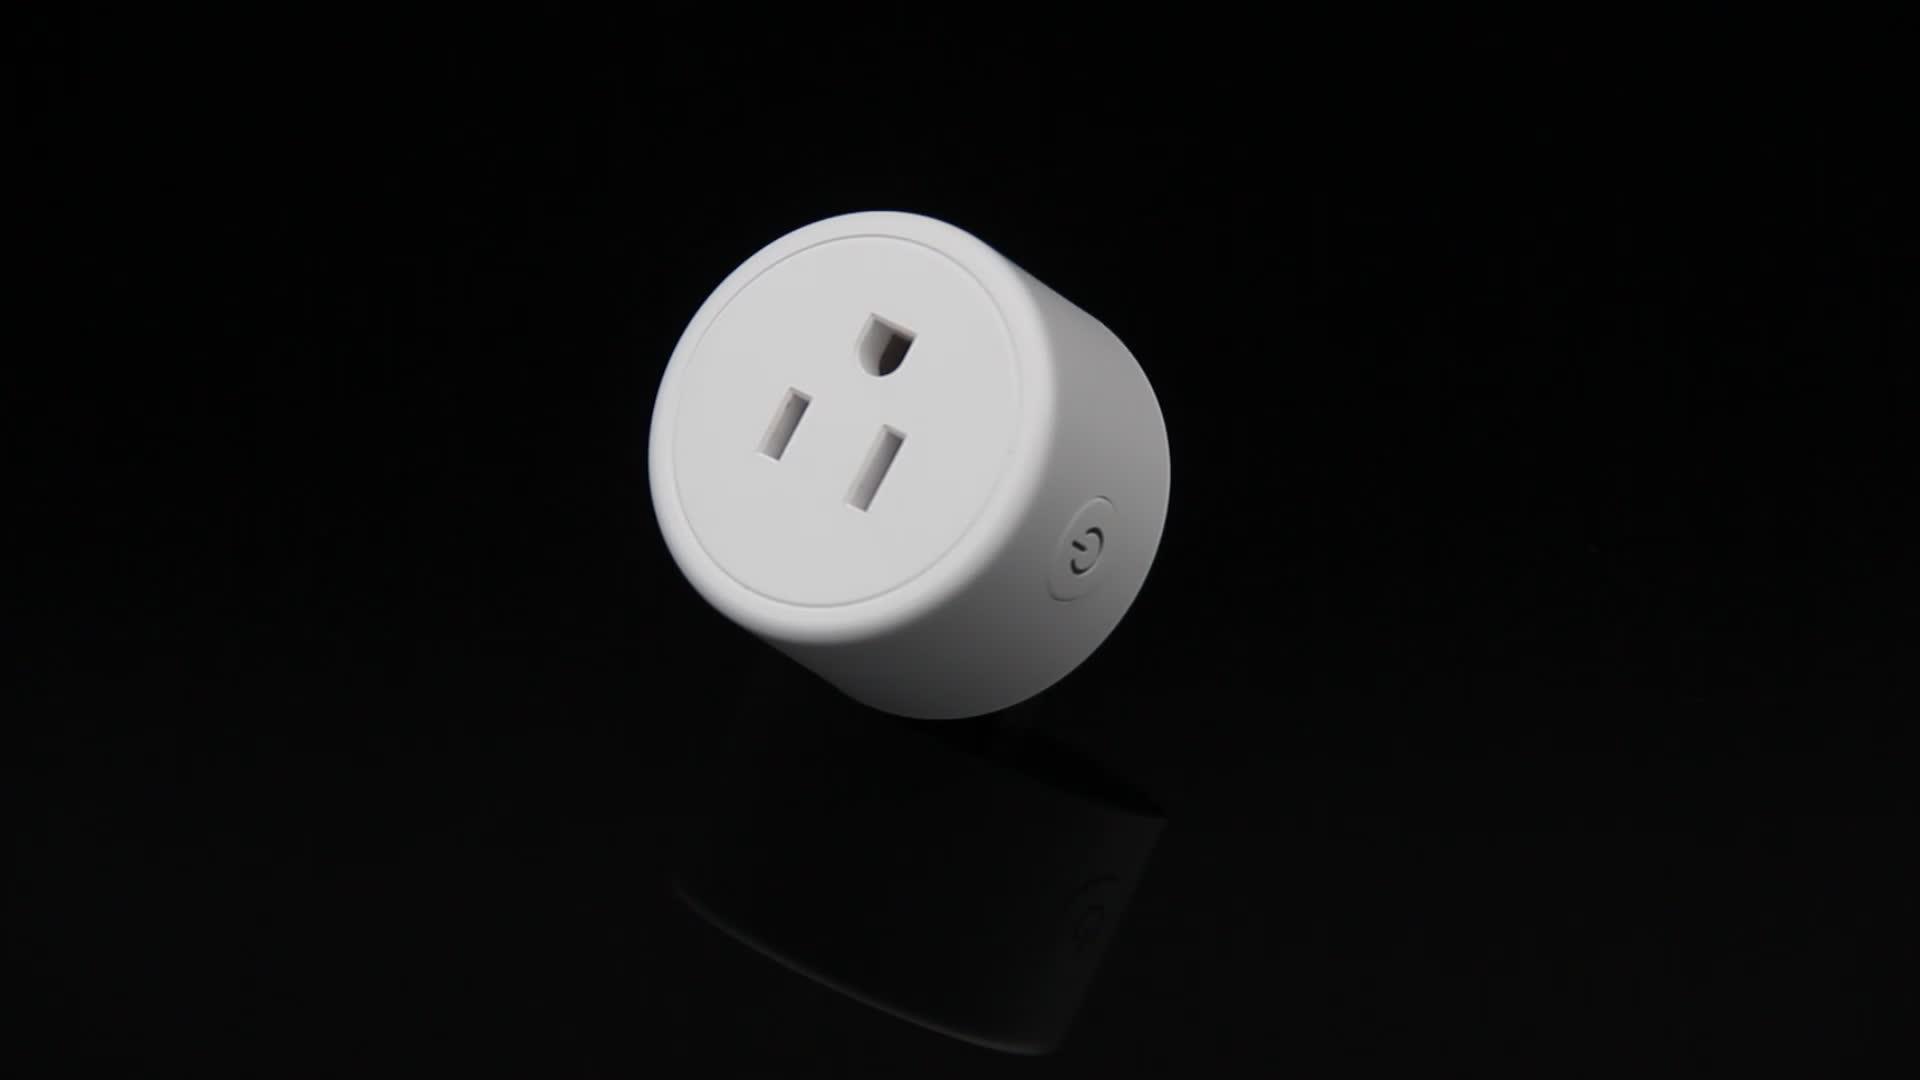 Frankever white APP controlled US standard wifi smart plug